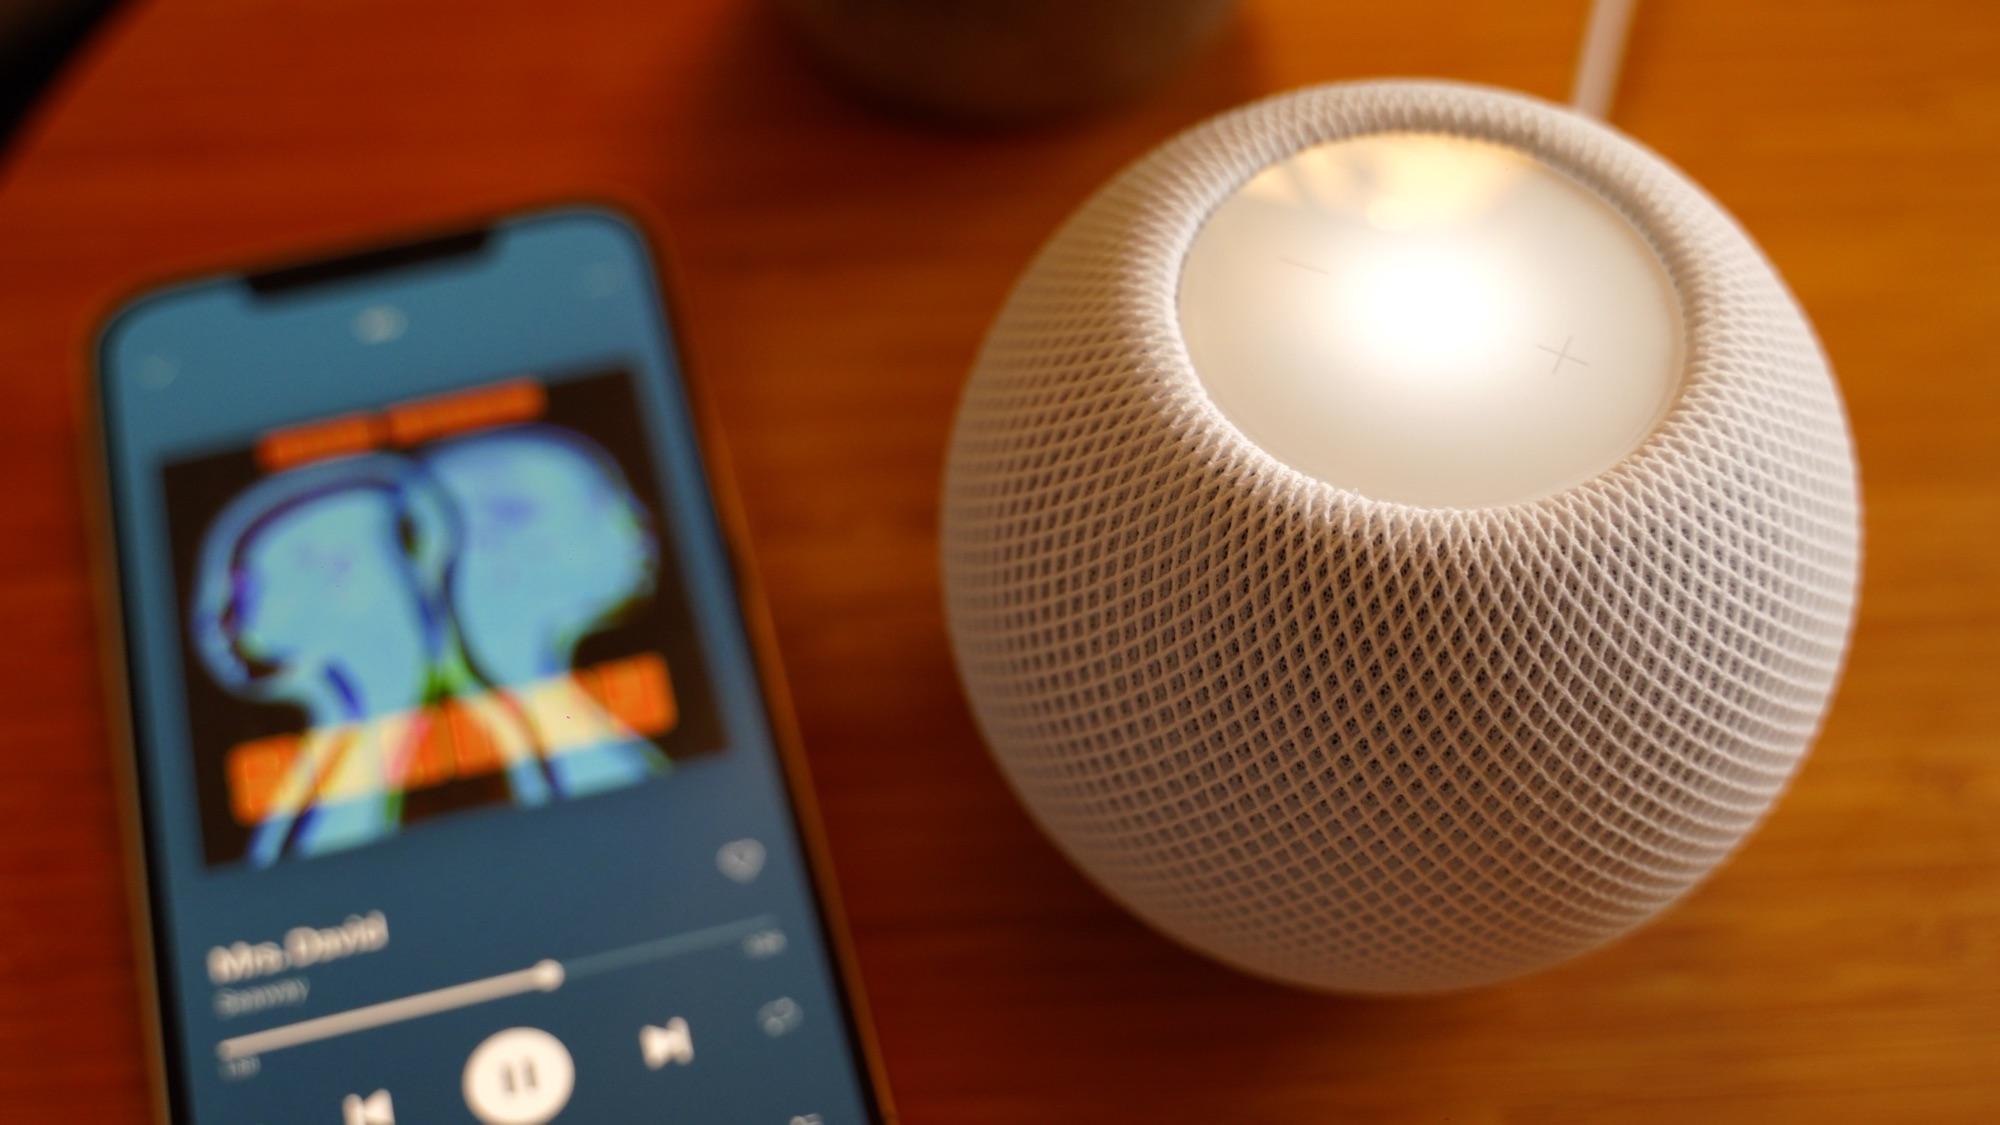 homepod-mini-next-to-iphone.jpg